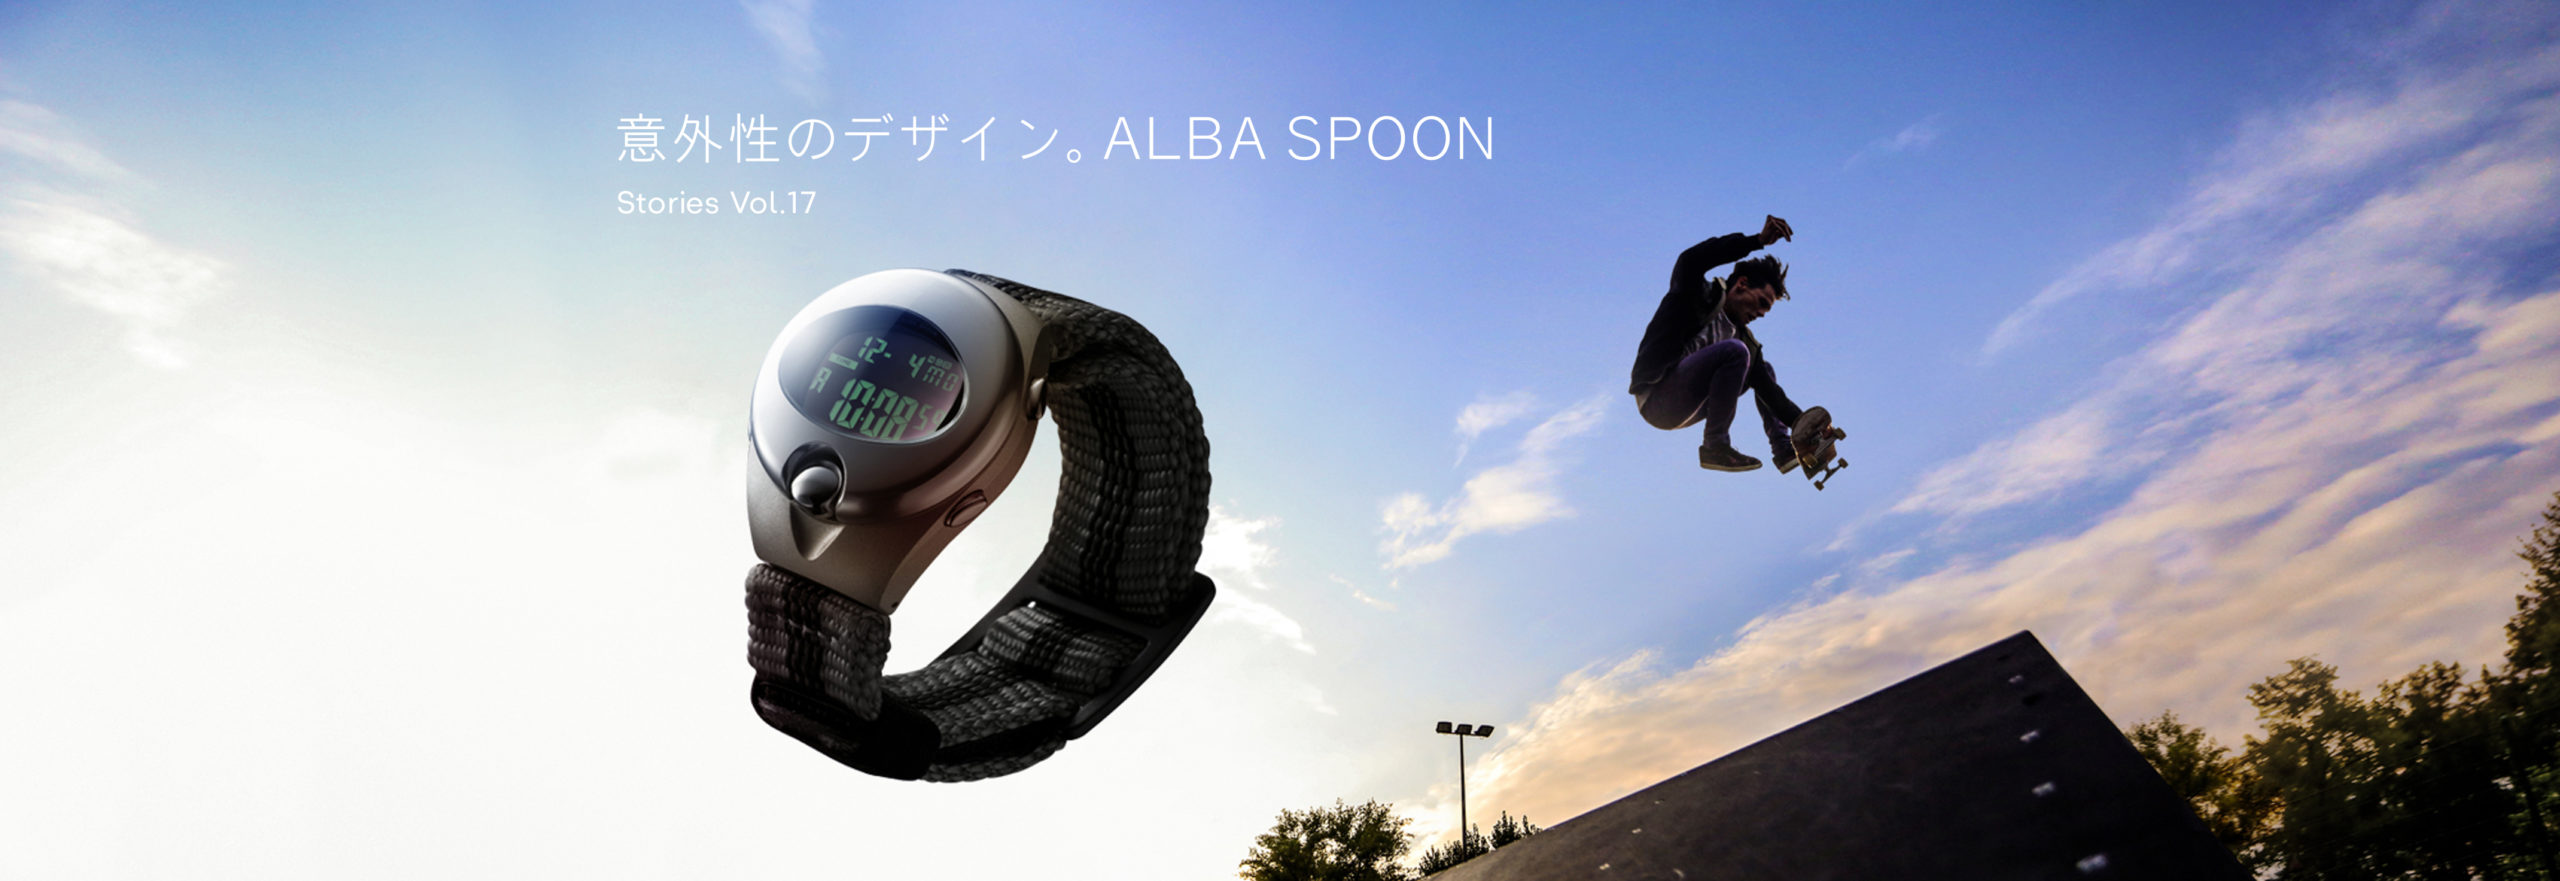 Vol.17 意外性のデザイン。ALBA SPOON